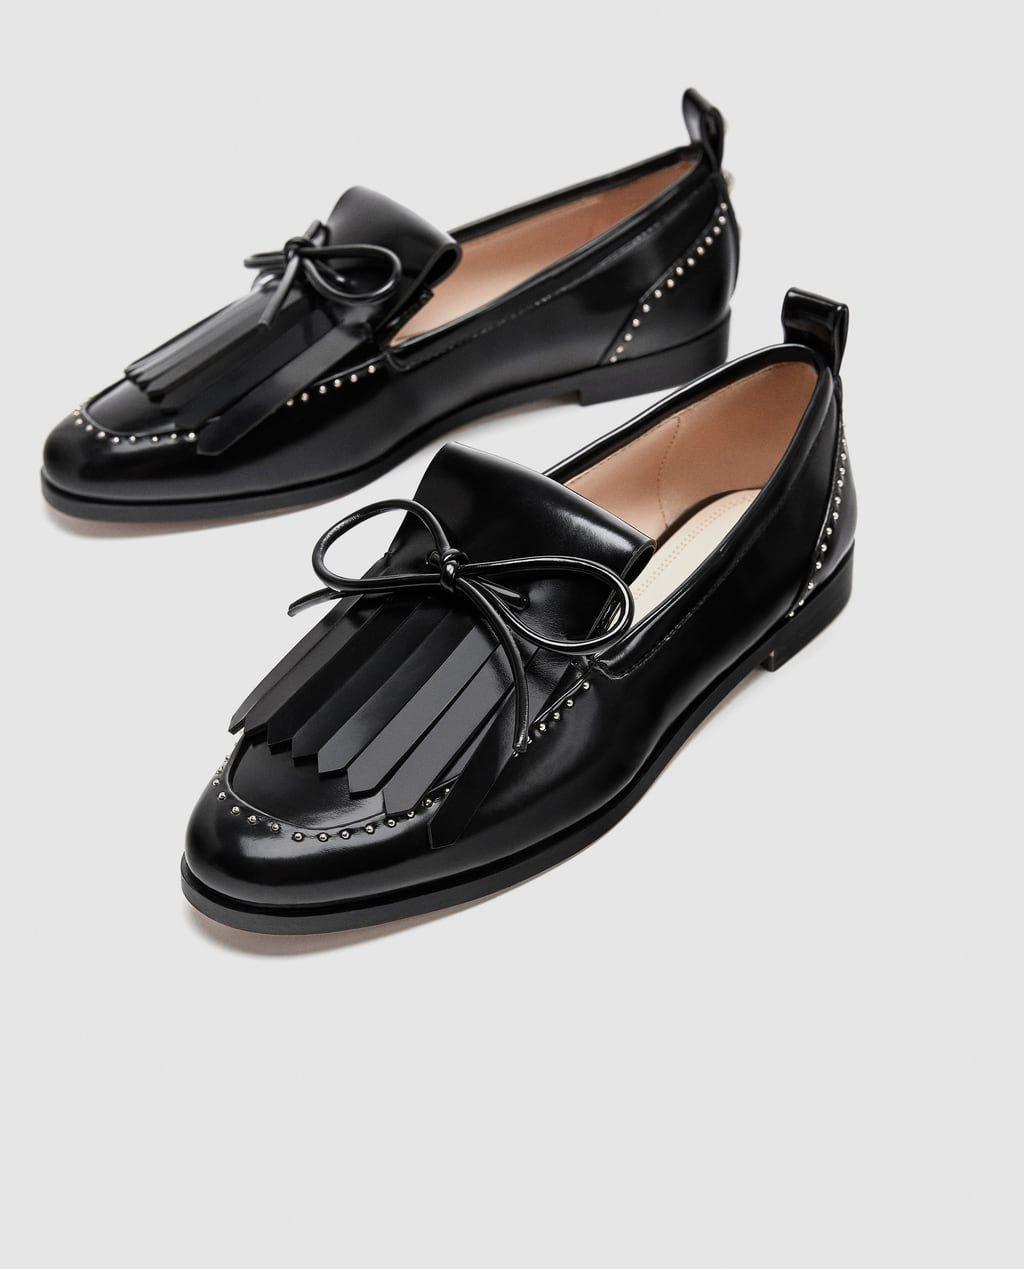 b326992f8fb Tout Chaussures Nœuds Canada Voir Vernis À Mocassins Femme Zara qtaAPP